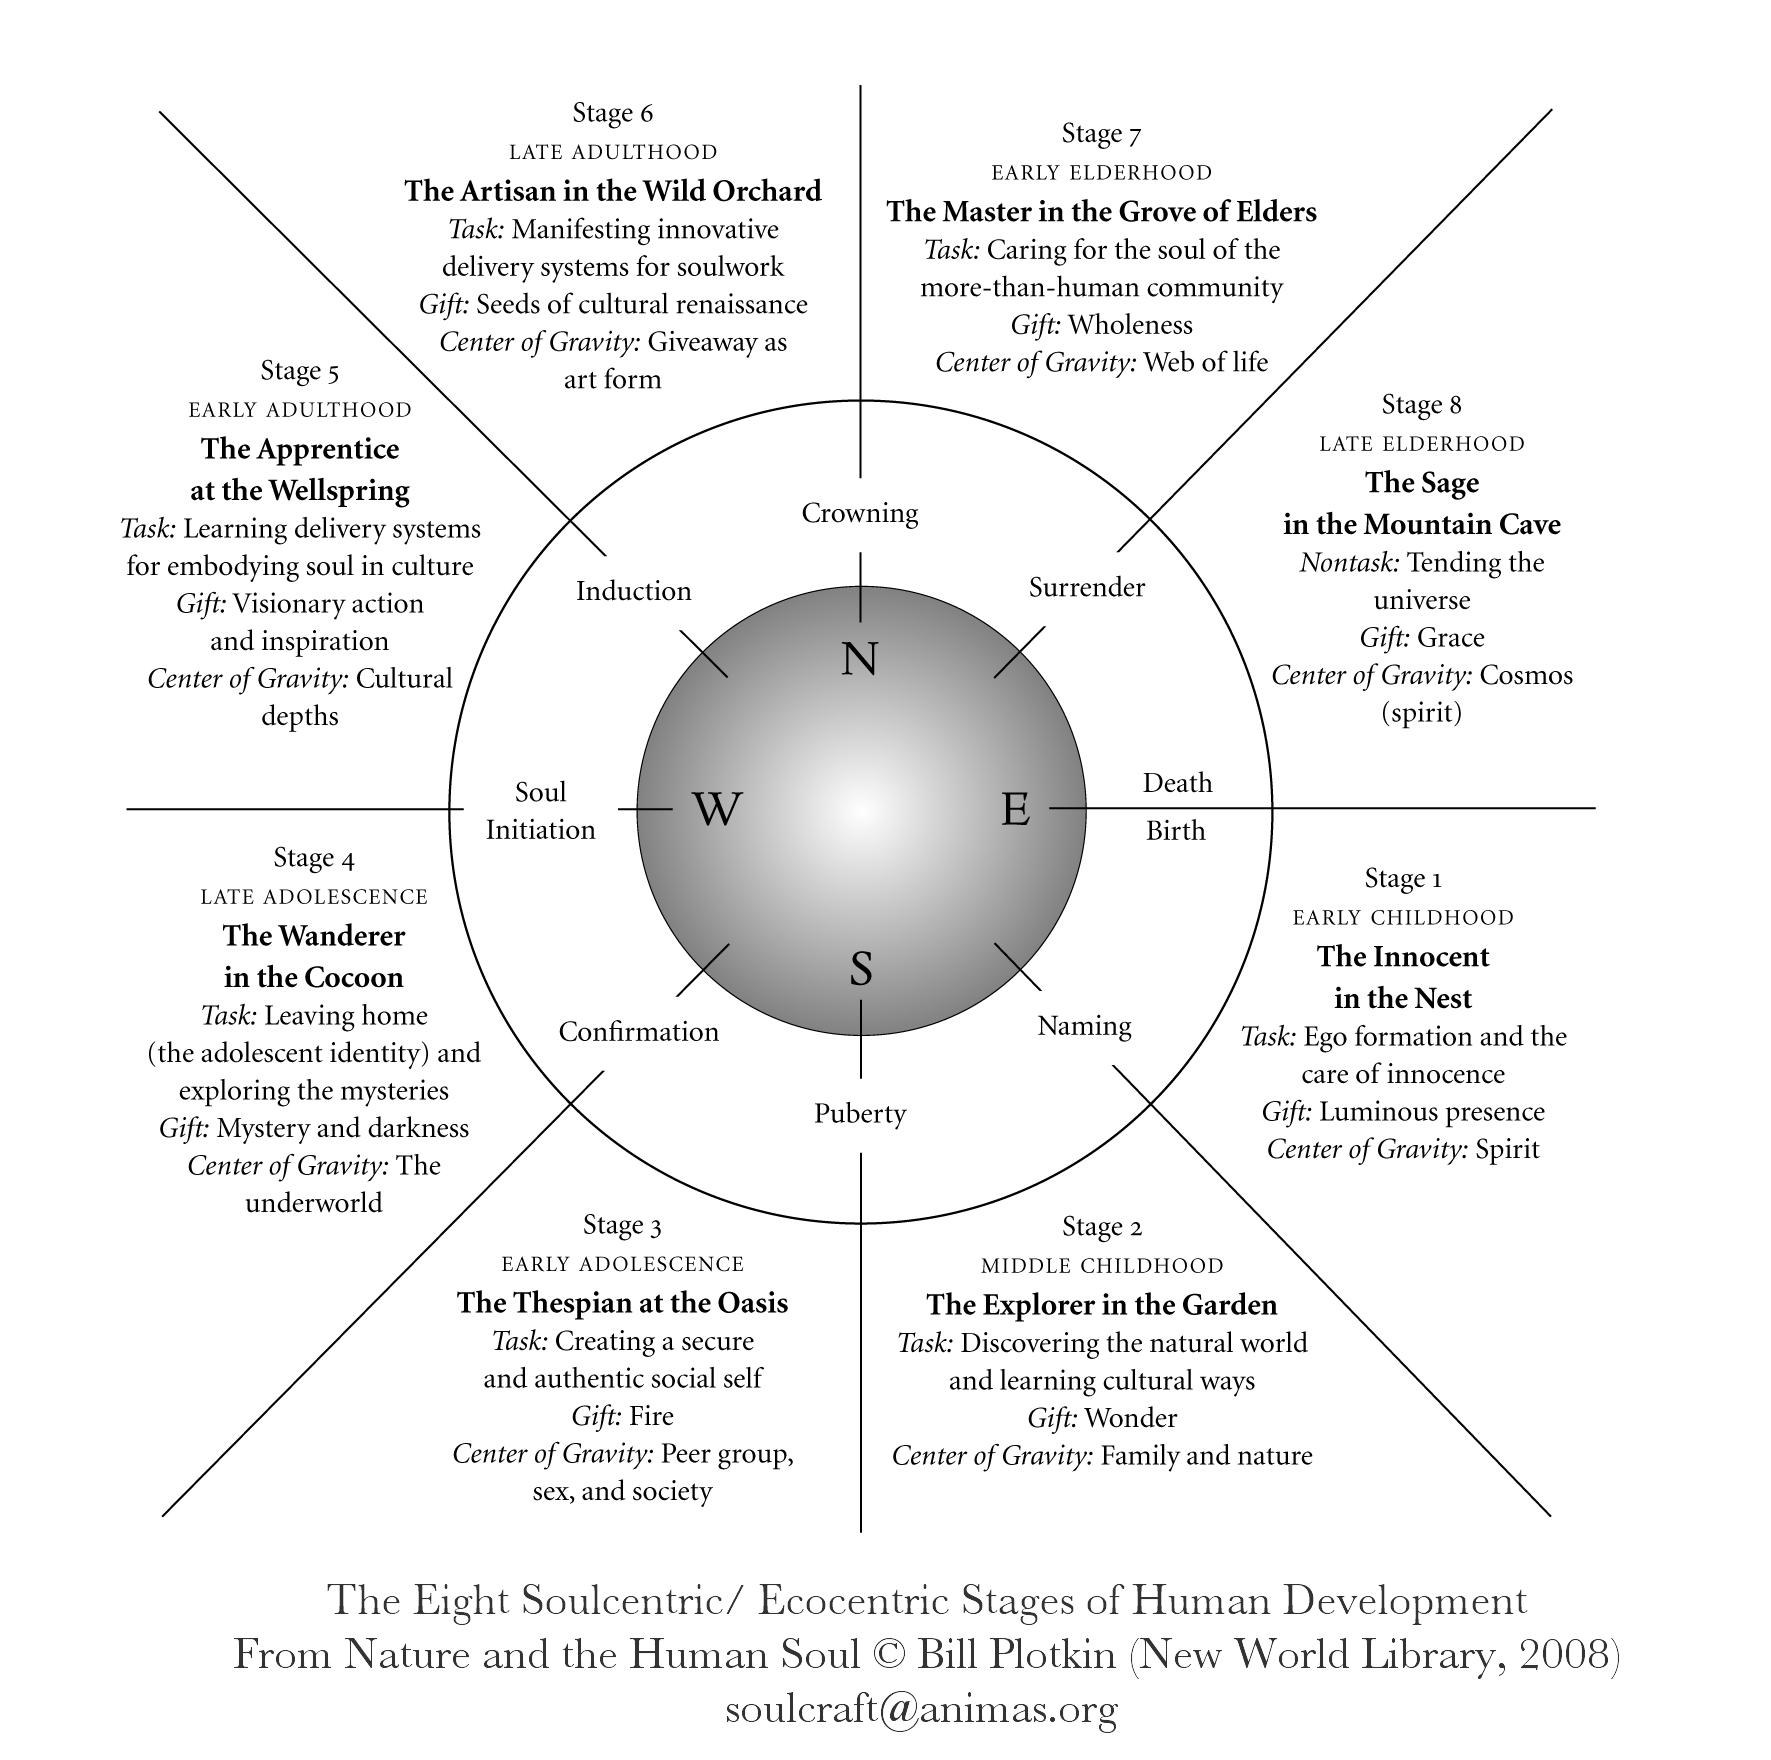 soul-centric-eco-centric-human-development